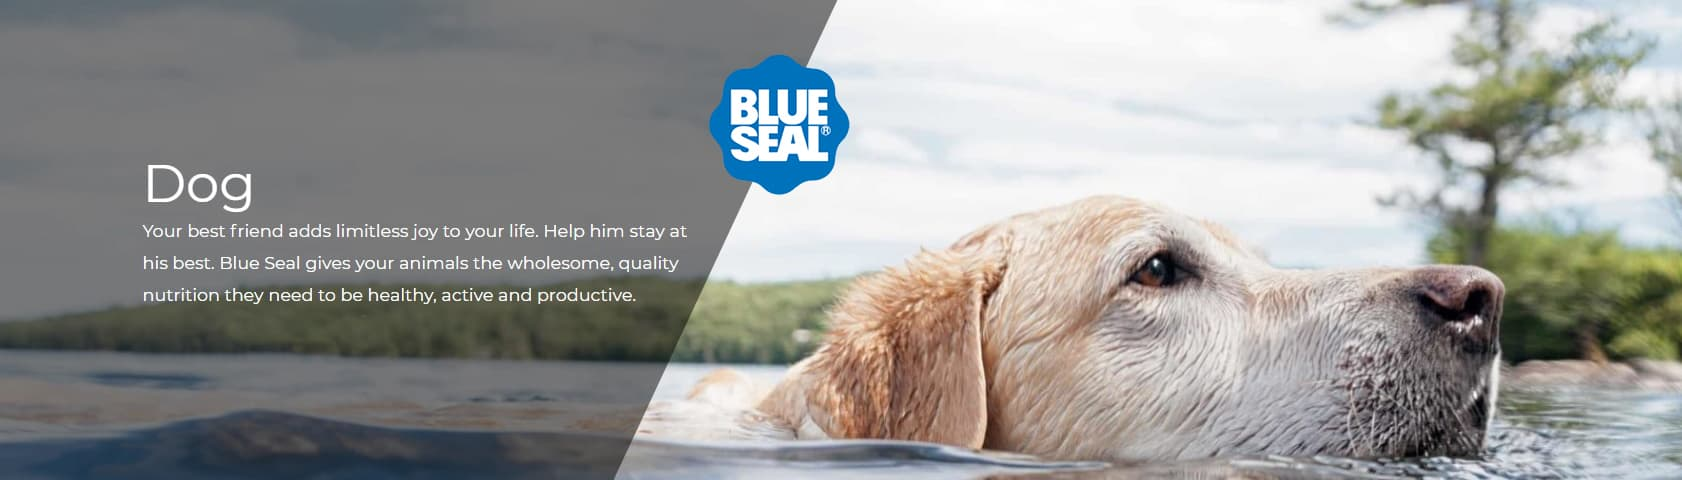 Blue Seal Dog Food: 2020 Review, Recalls & Coupons 1